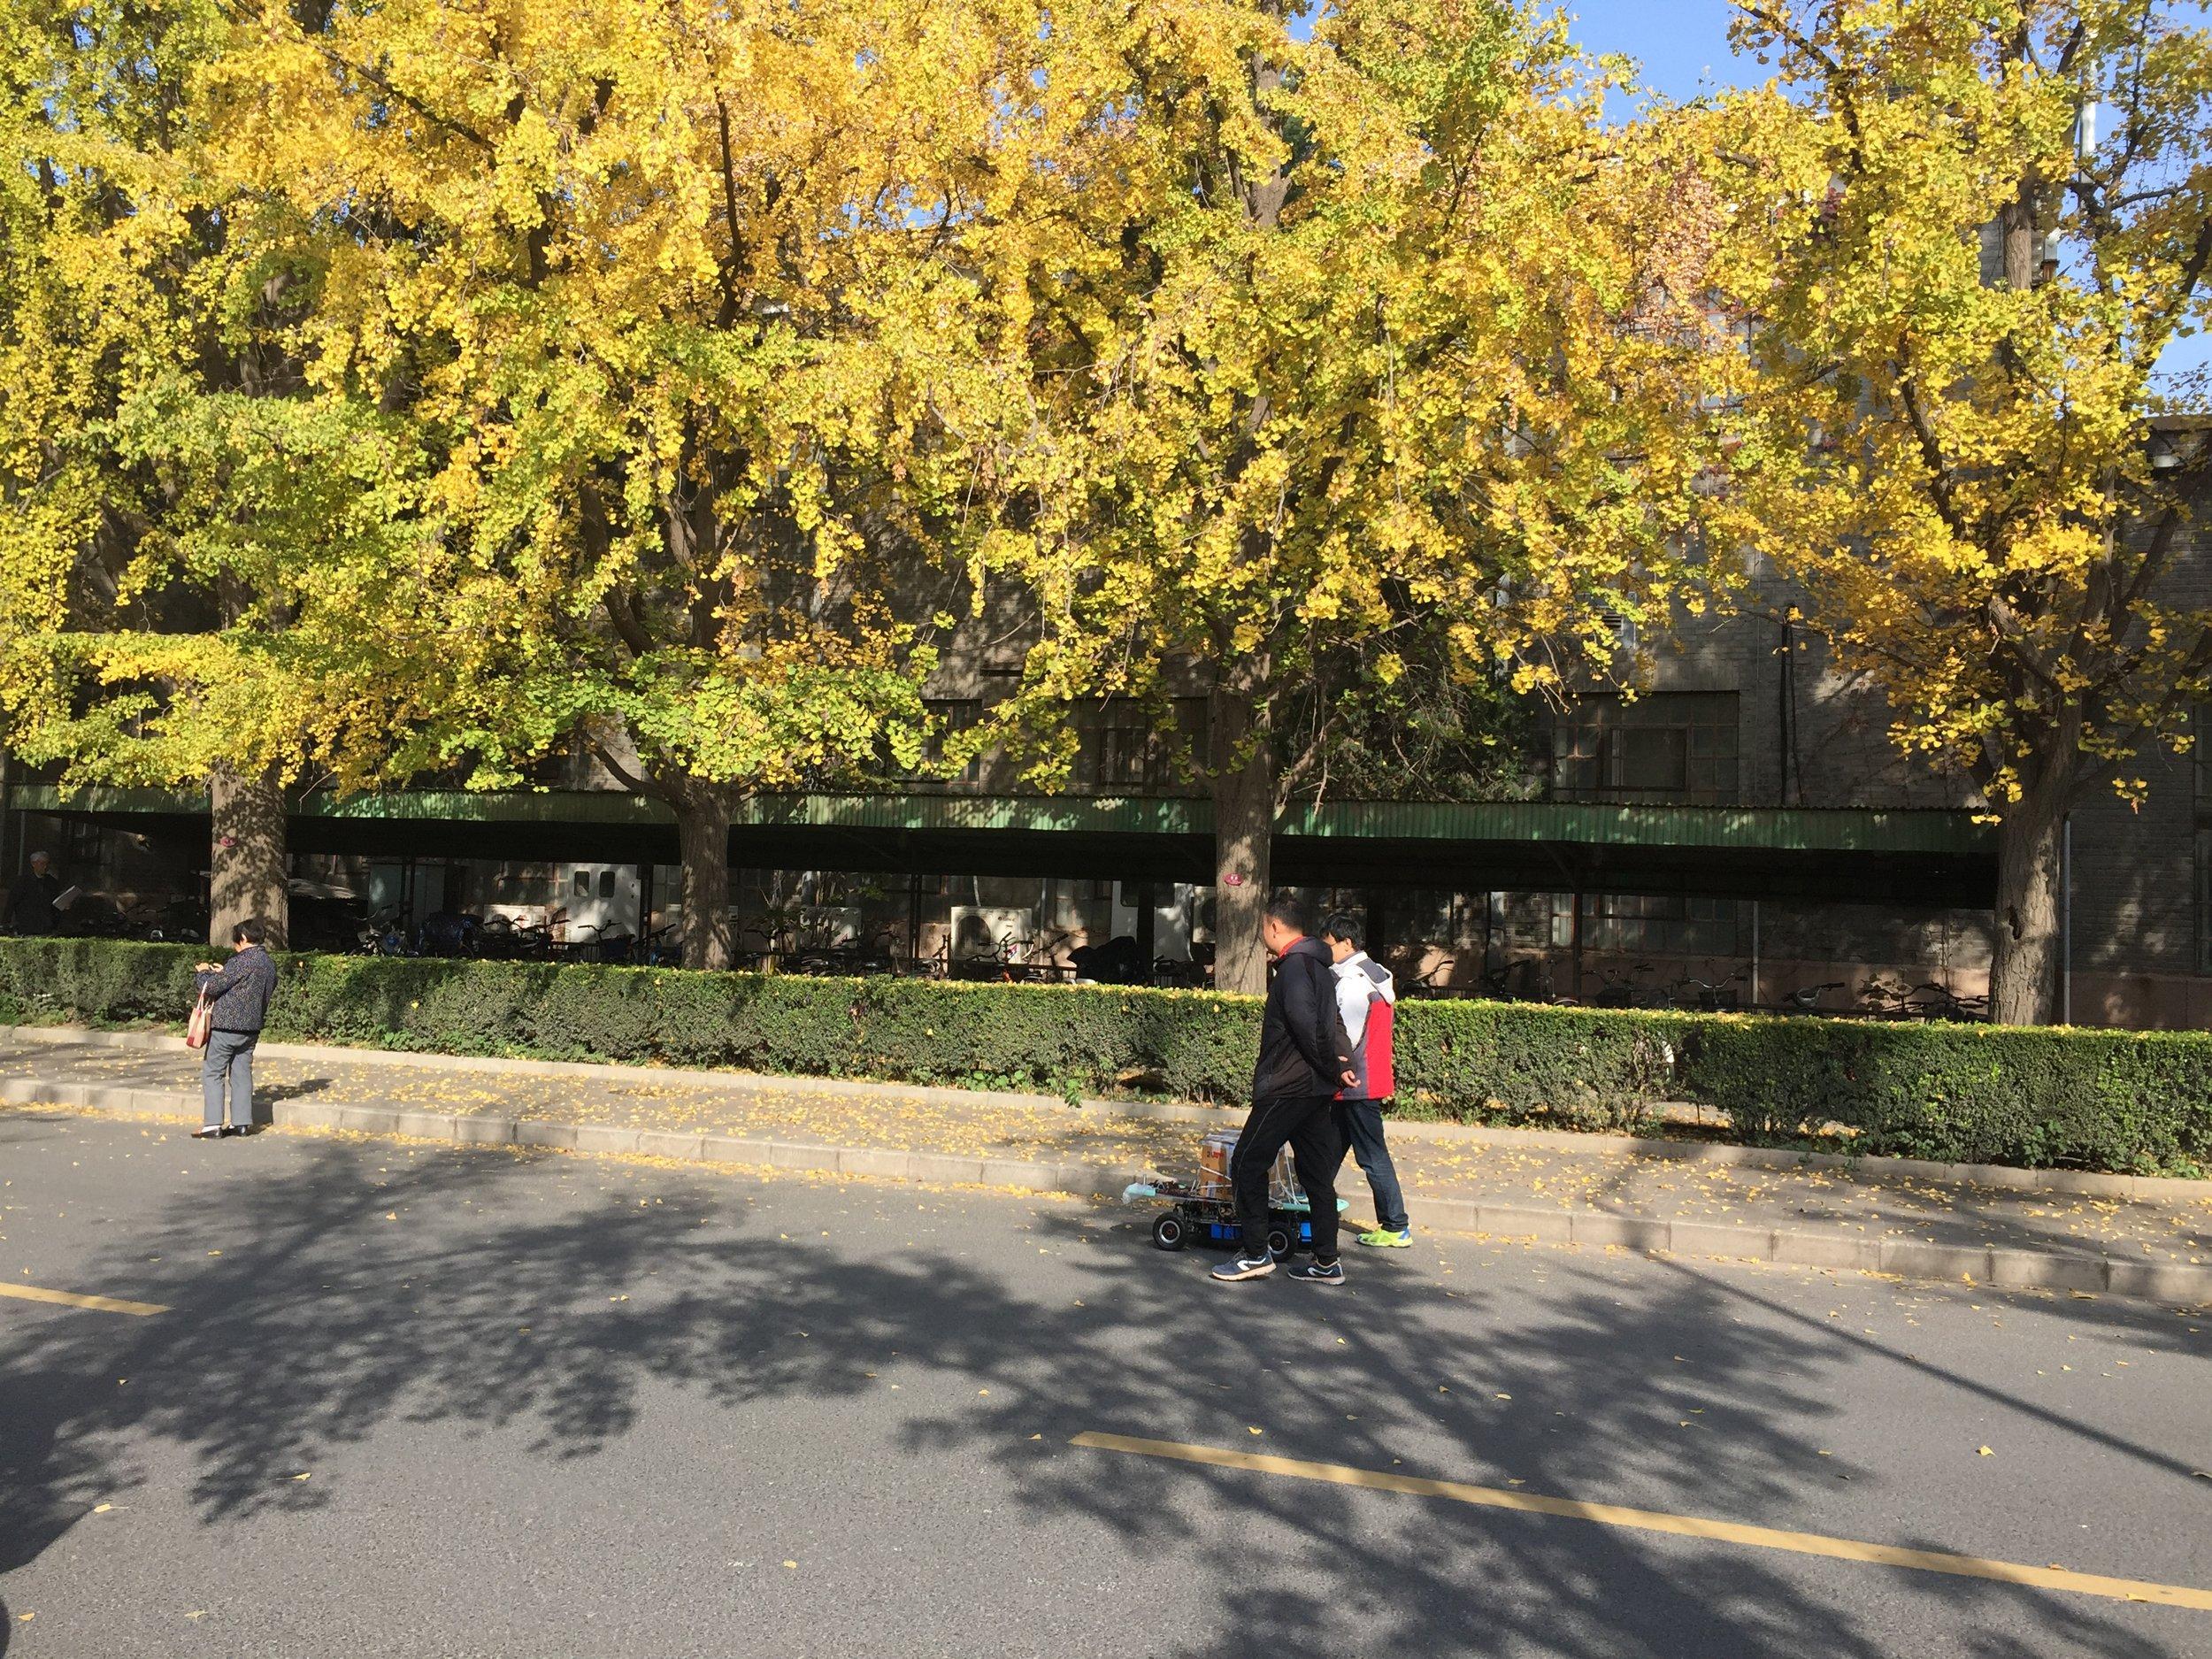 On the campus of Tsinghua University